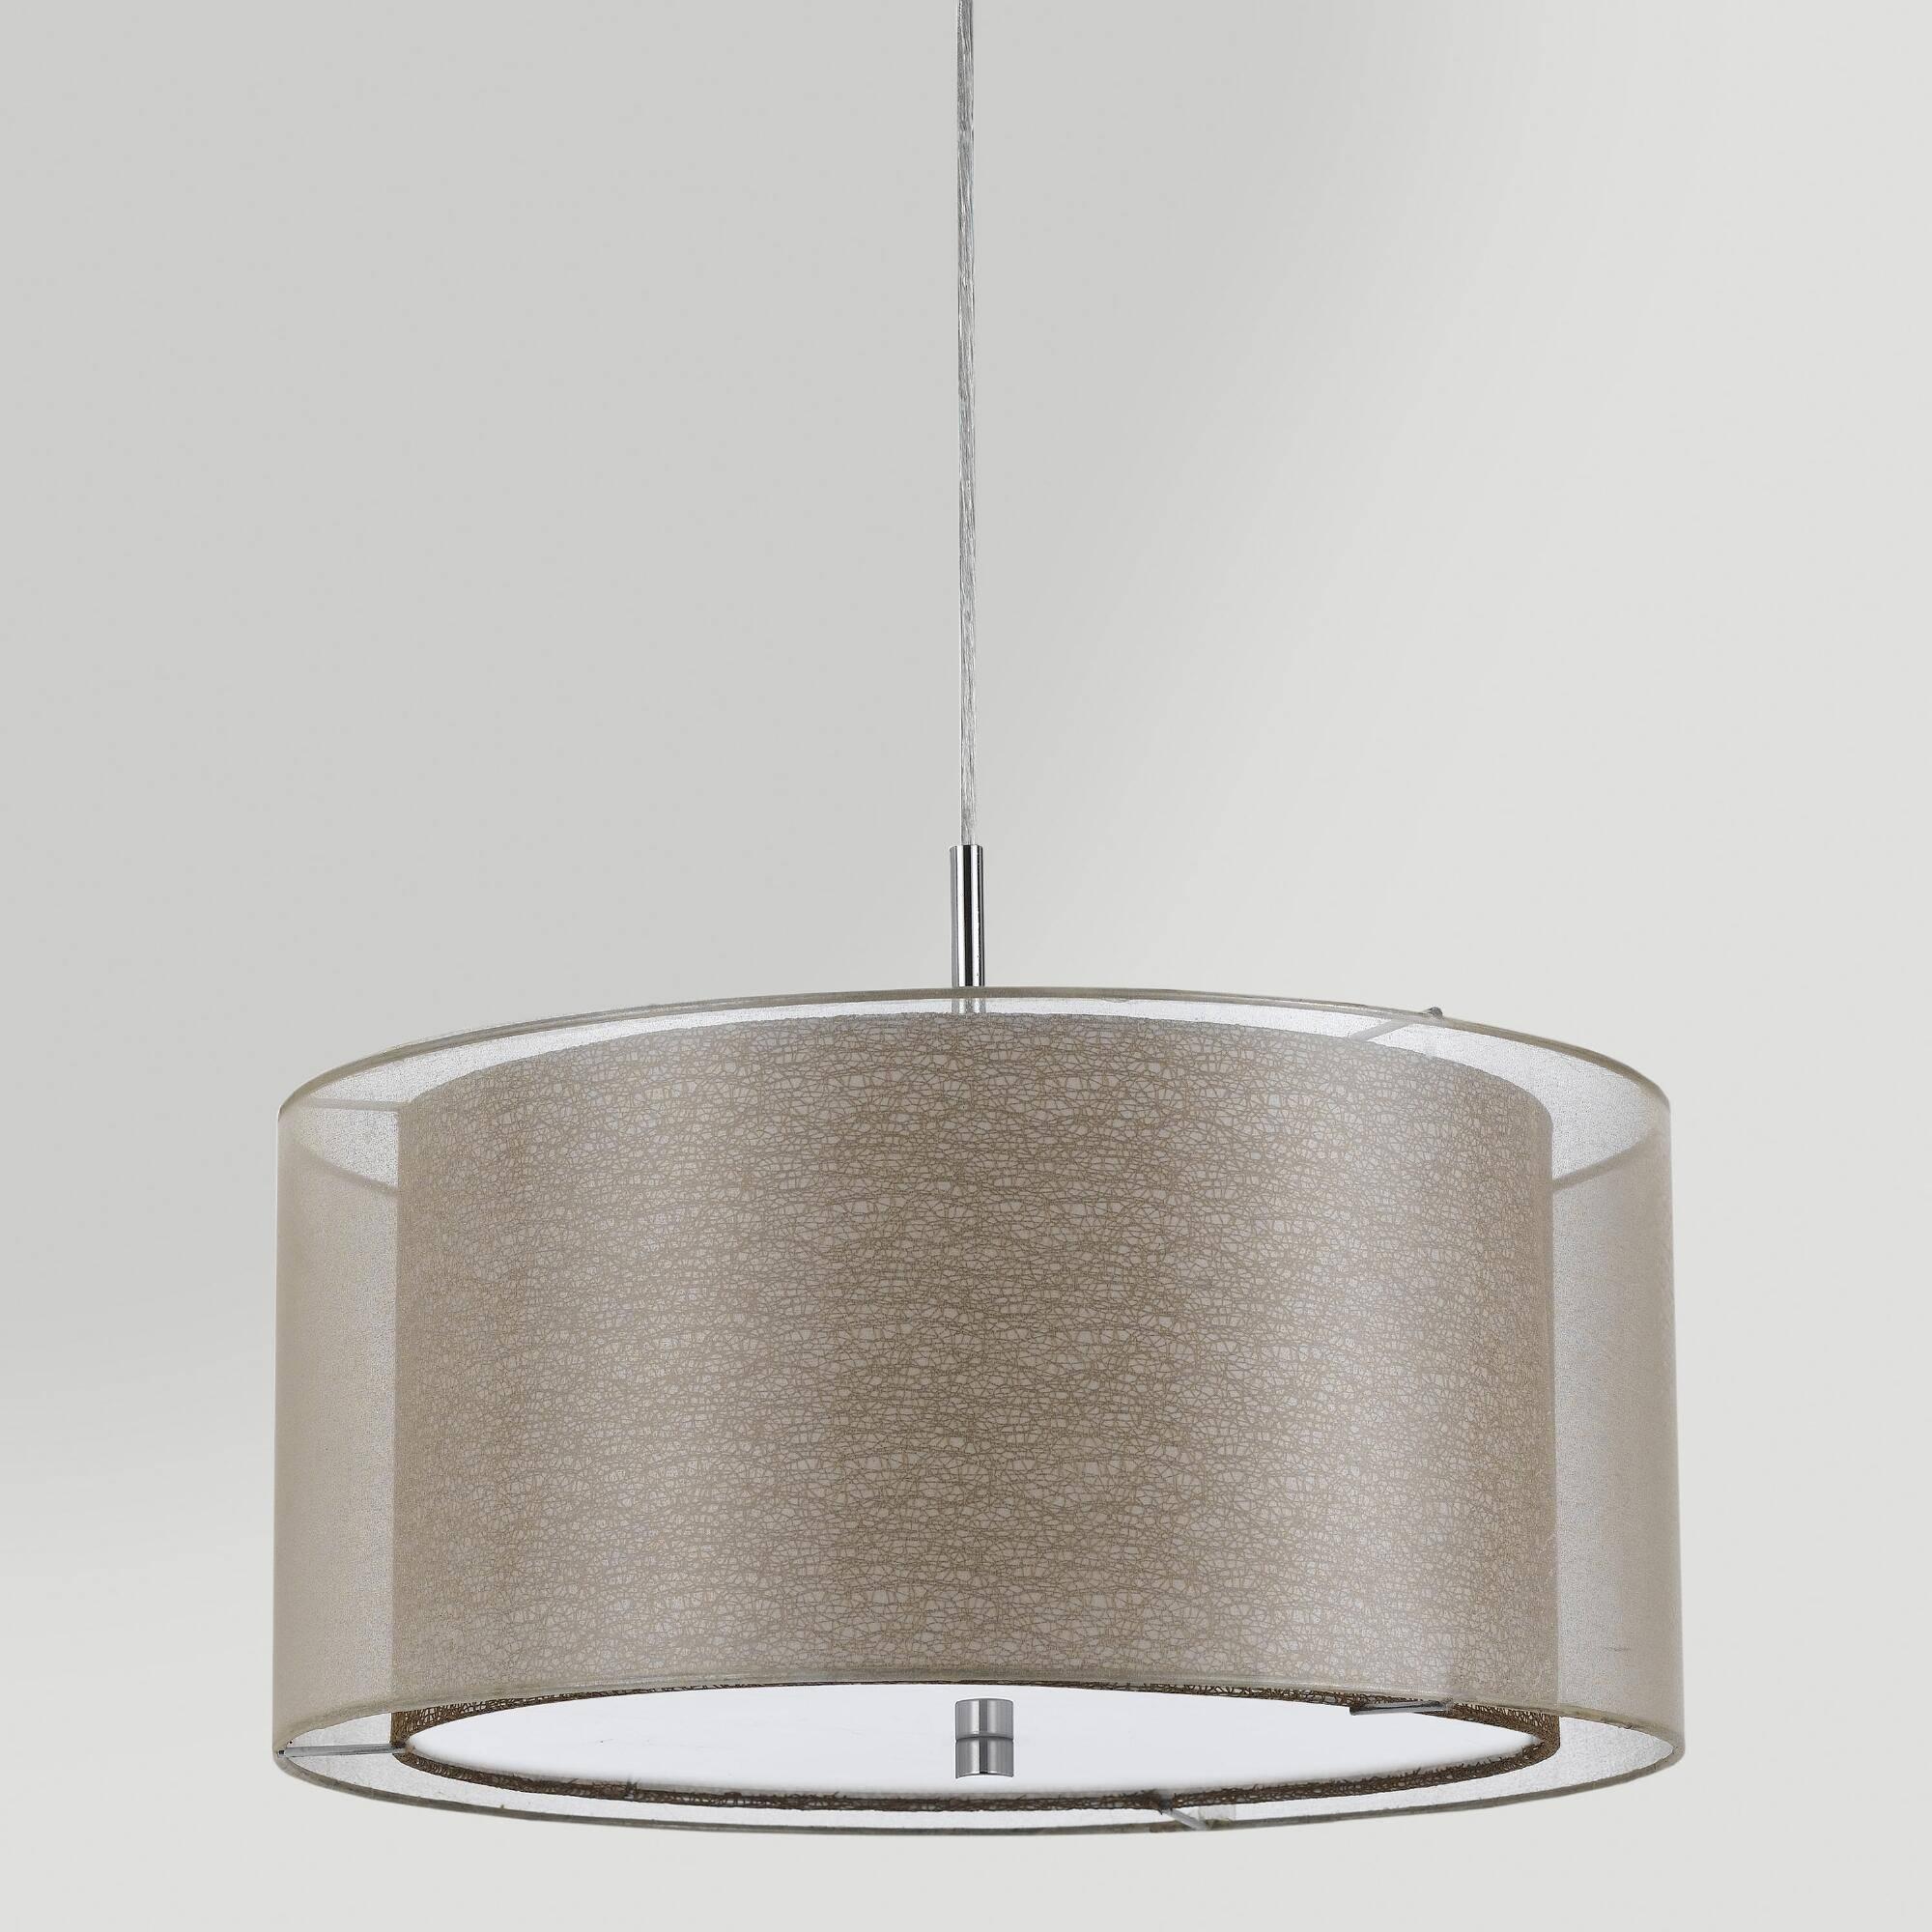 Hanging Pendant Lights - Hbwonong within Rattan Pendant Lighting (Image 5 of 15)